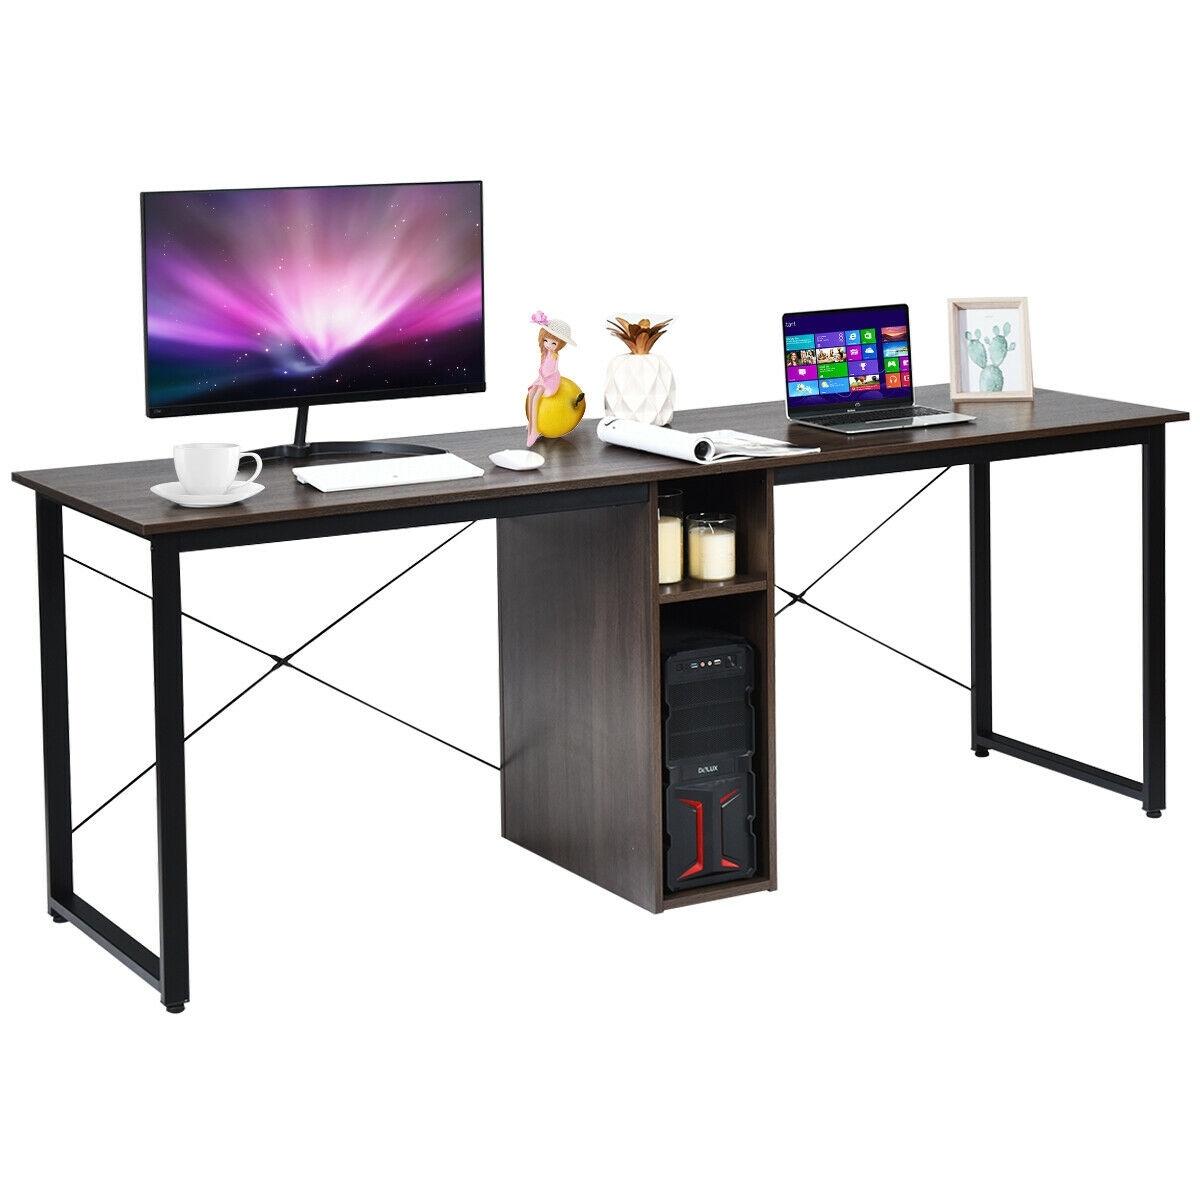 - Shop Gymax 2 Person Computer Desk 79